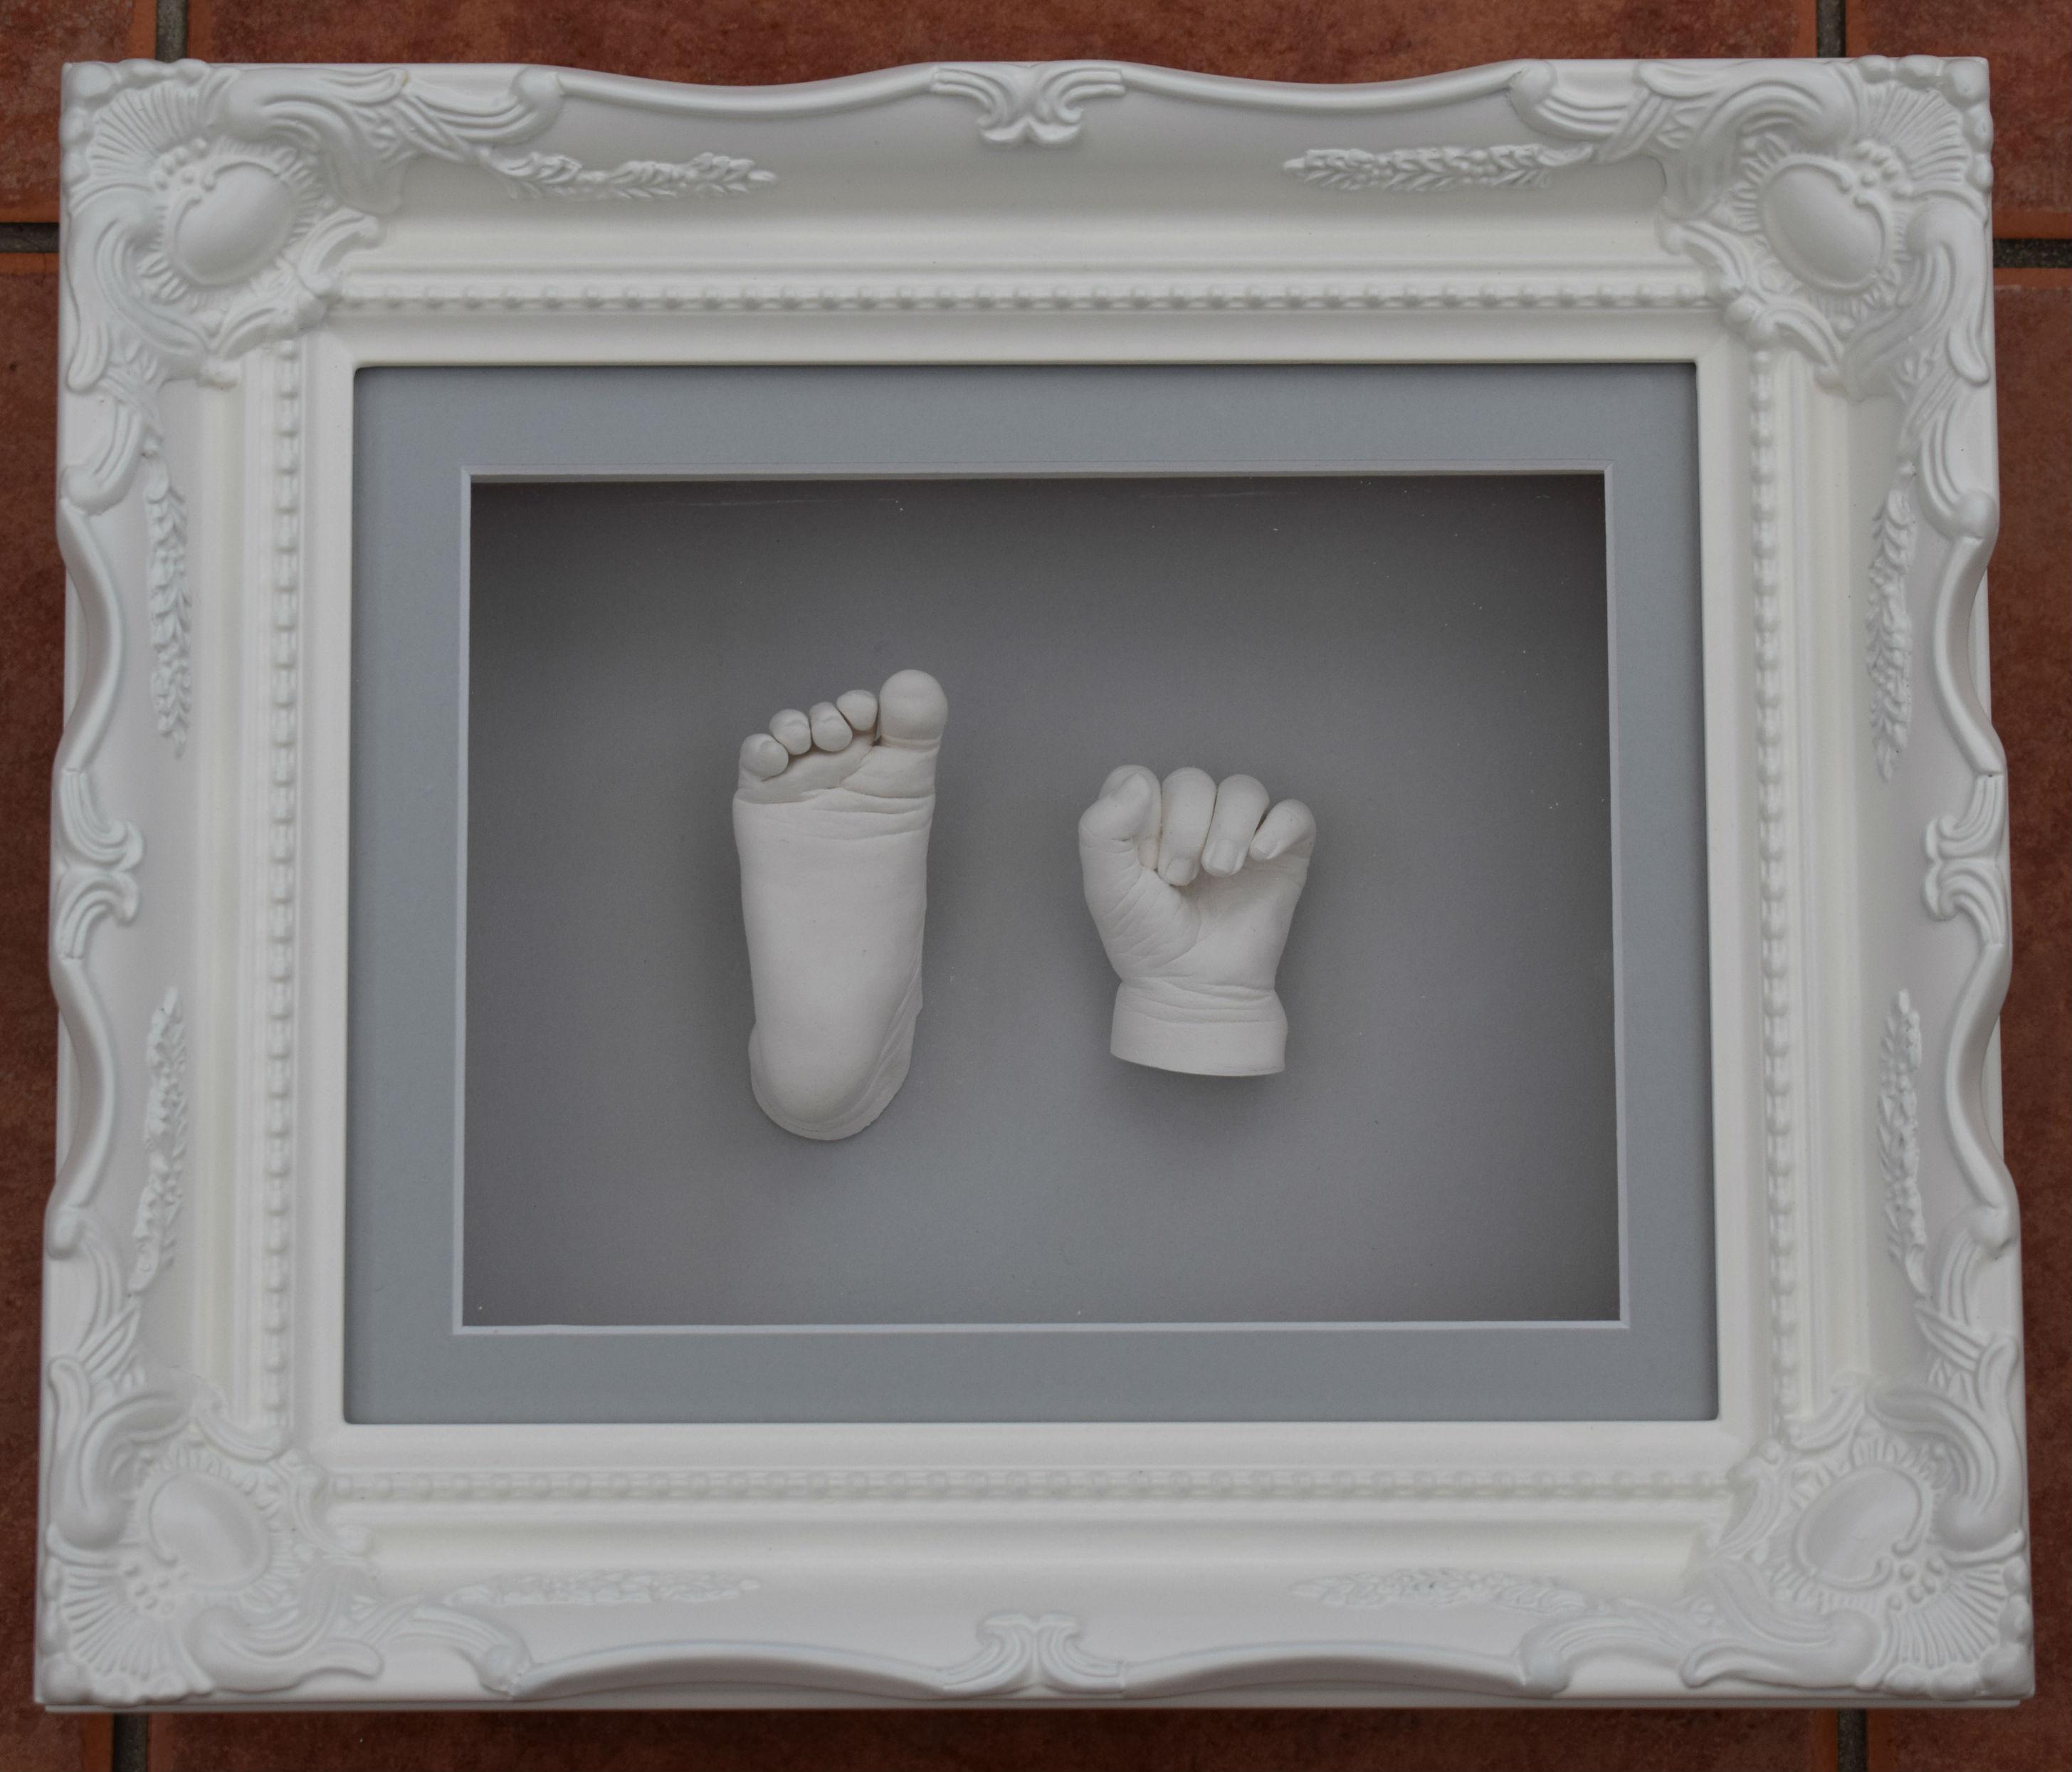 Framed hand and feet